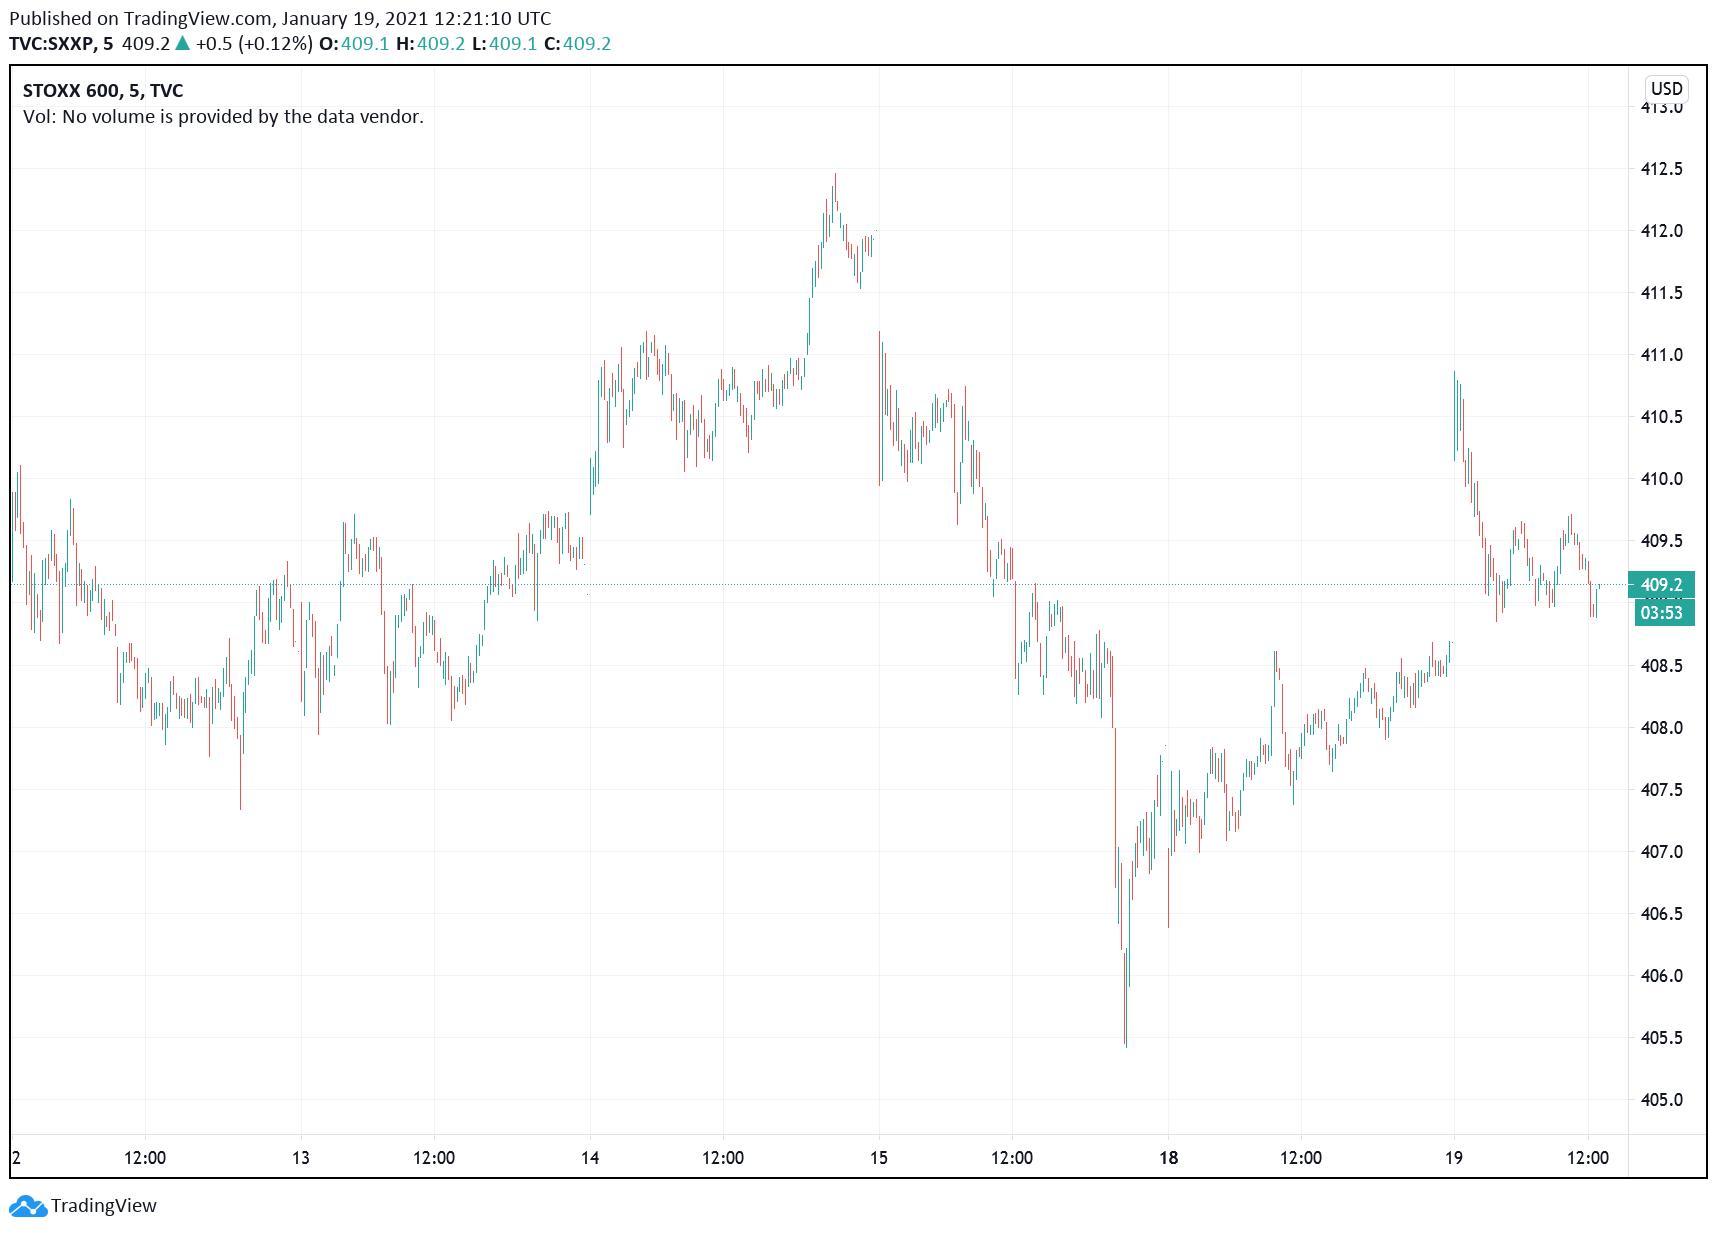 Stoxx 600 chart. (tradingview.com)